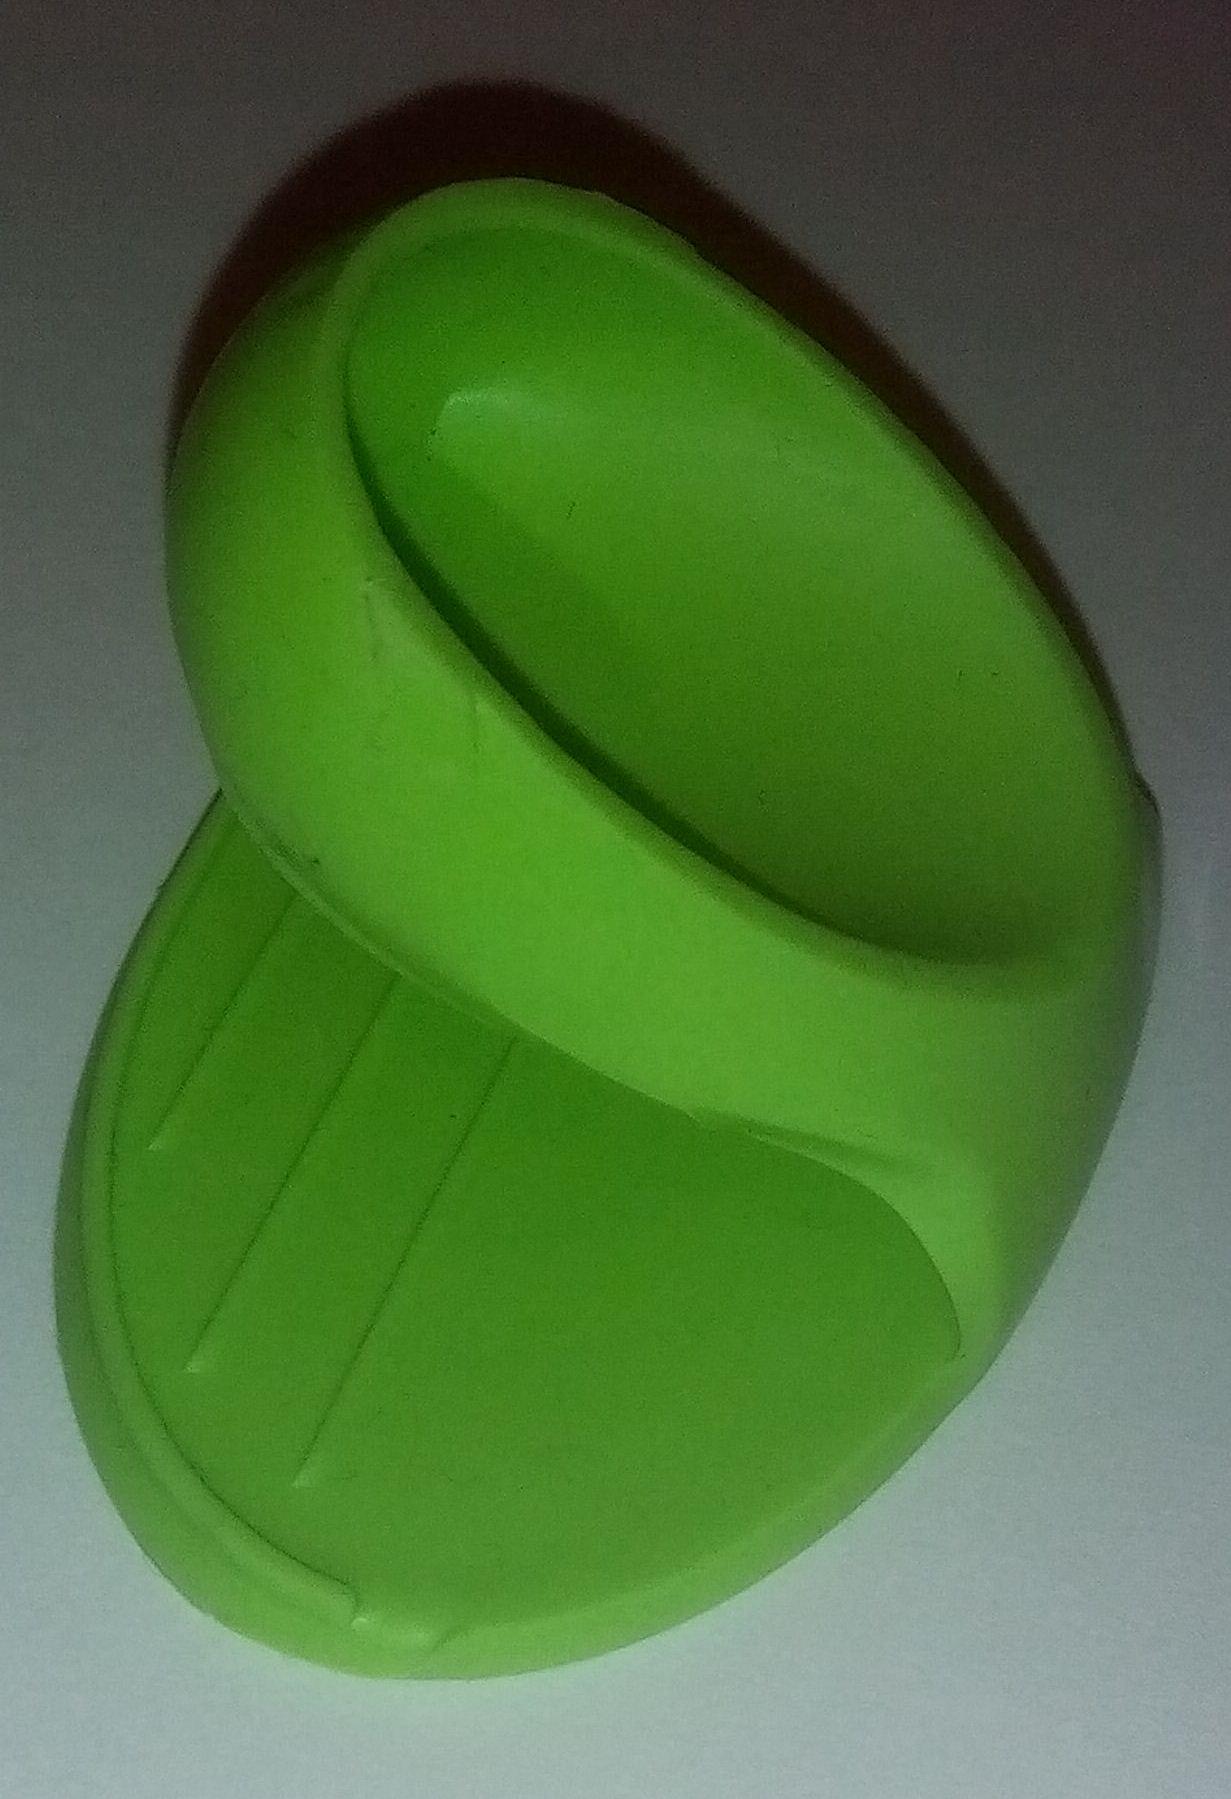 topfhandschuhe ofenhandschuhe silikonhandschuh topflappen. Black Bedroom Furniture Sets. Home Design Ideas